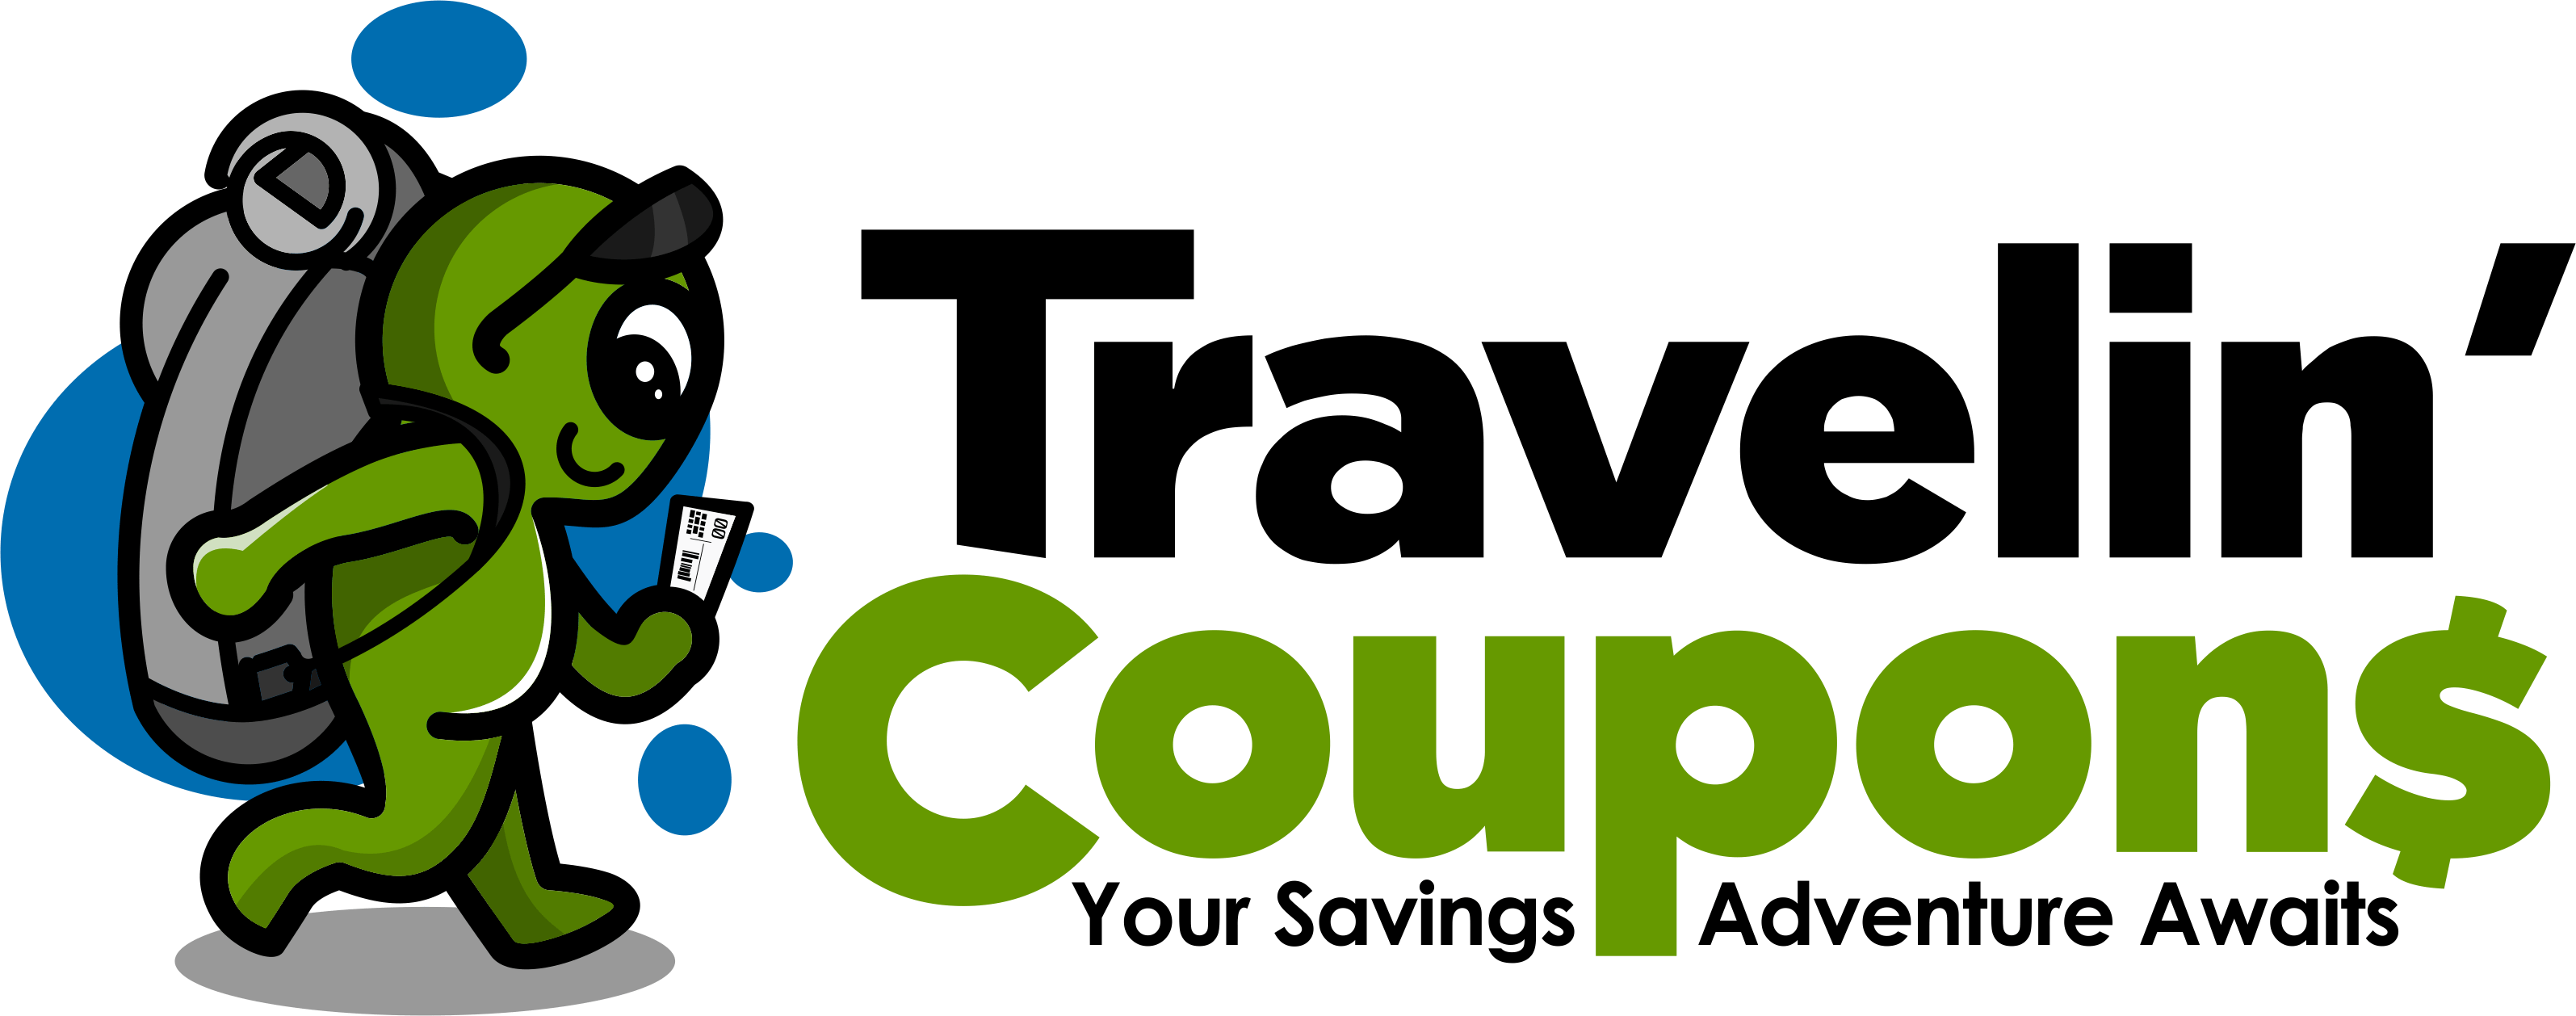 Gatlinburg coupons and discounts